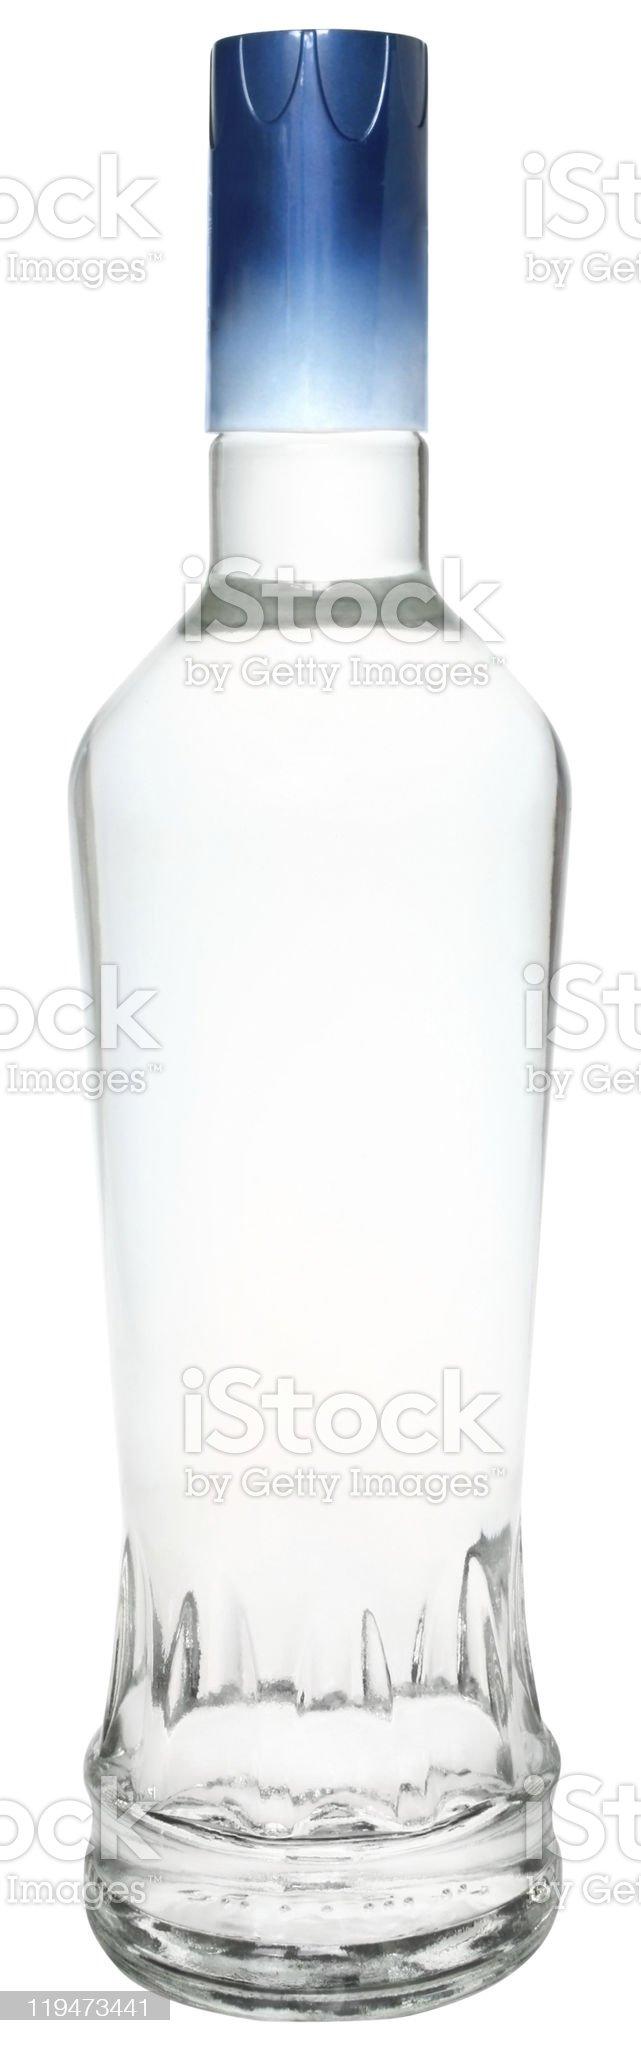 Vodka royalty-free stock photo